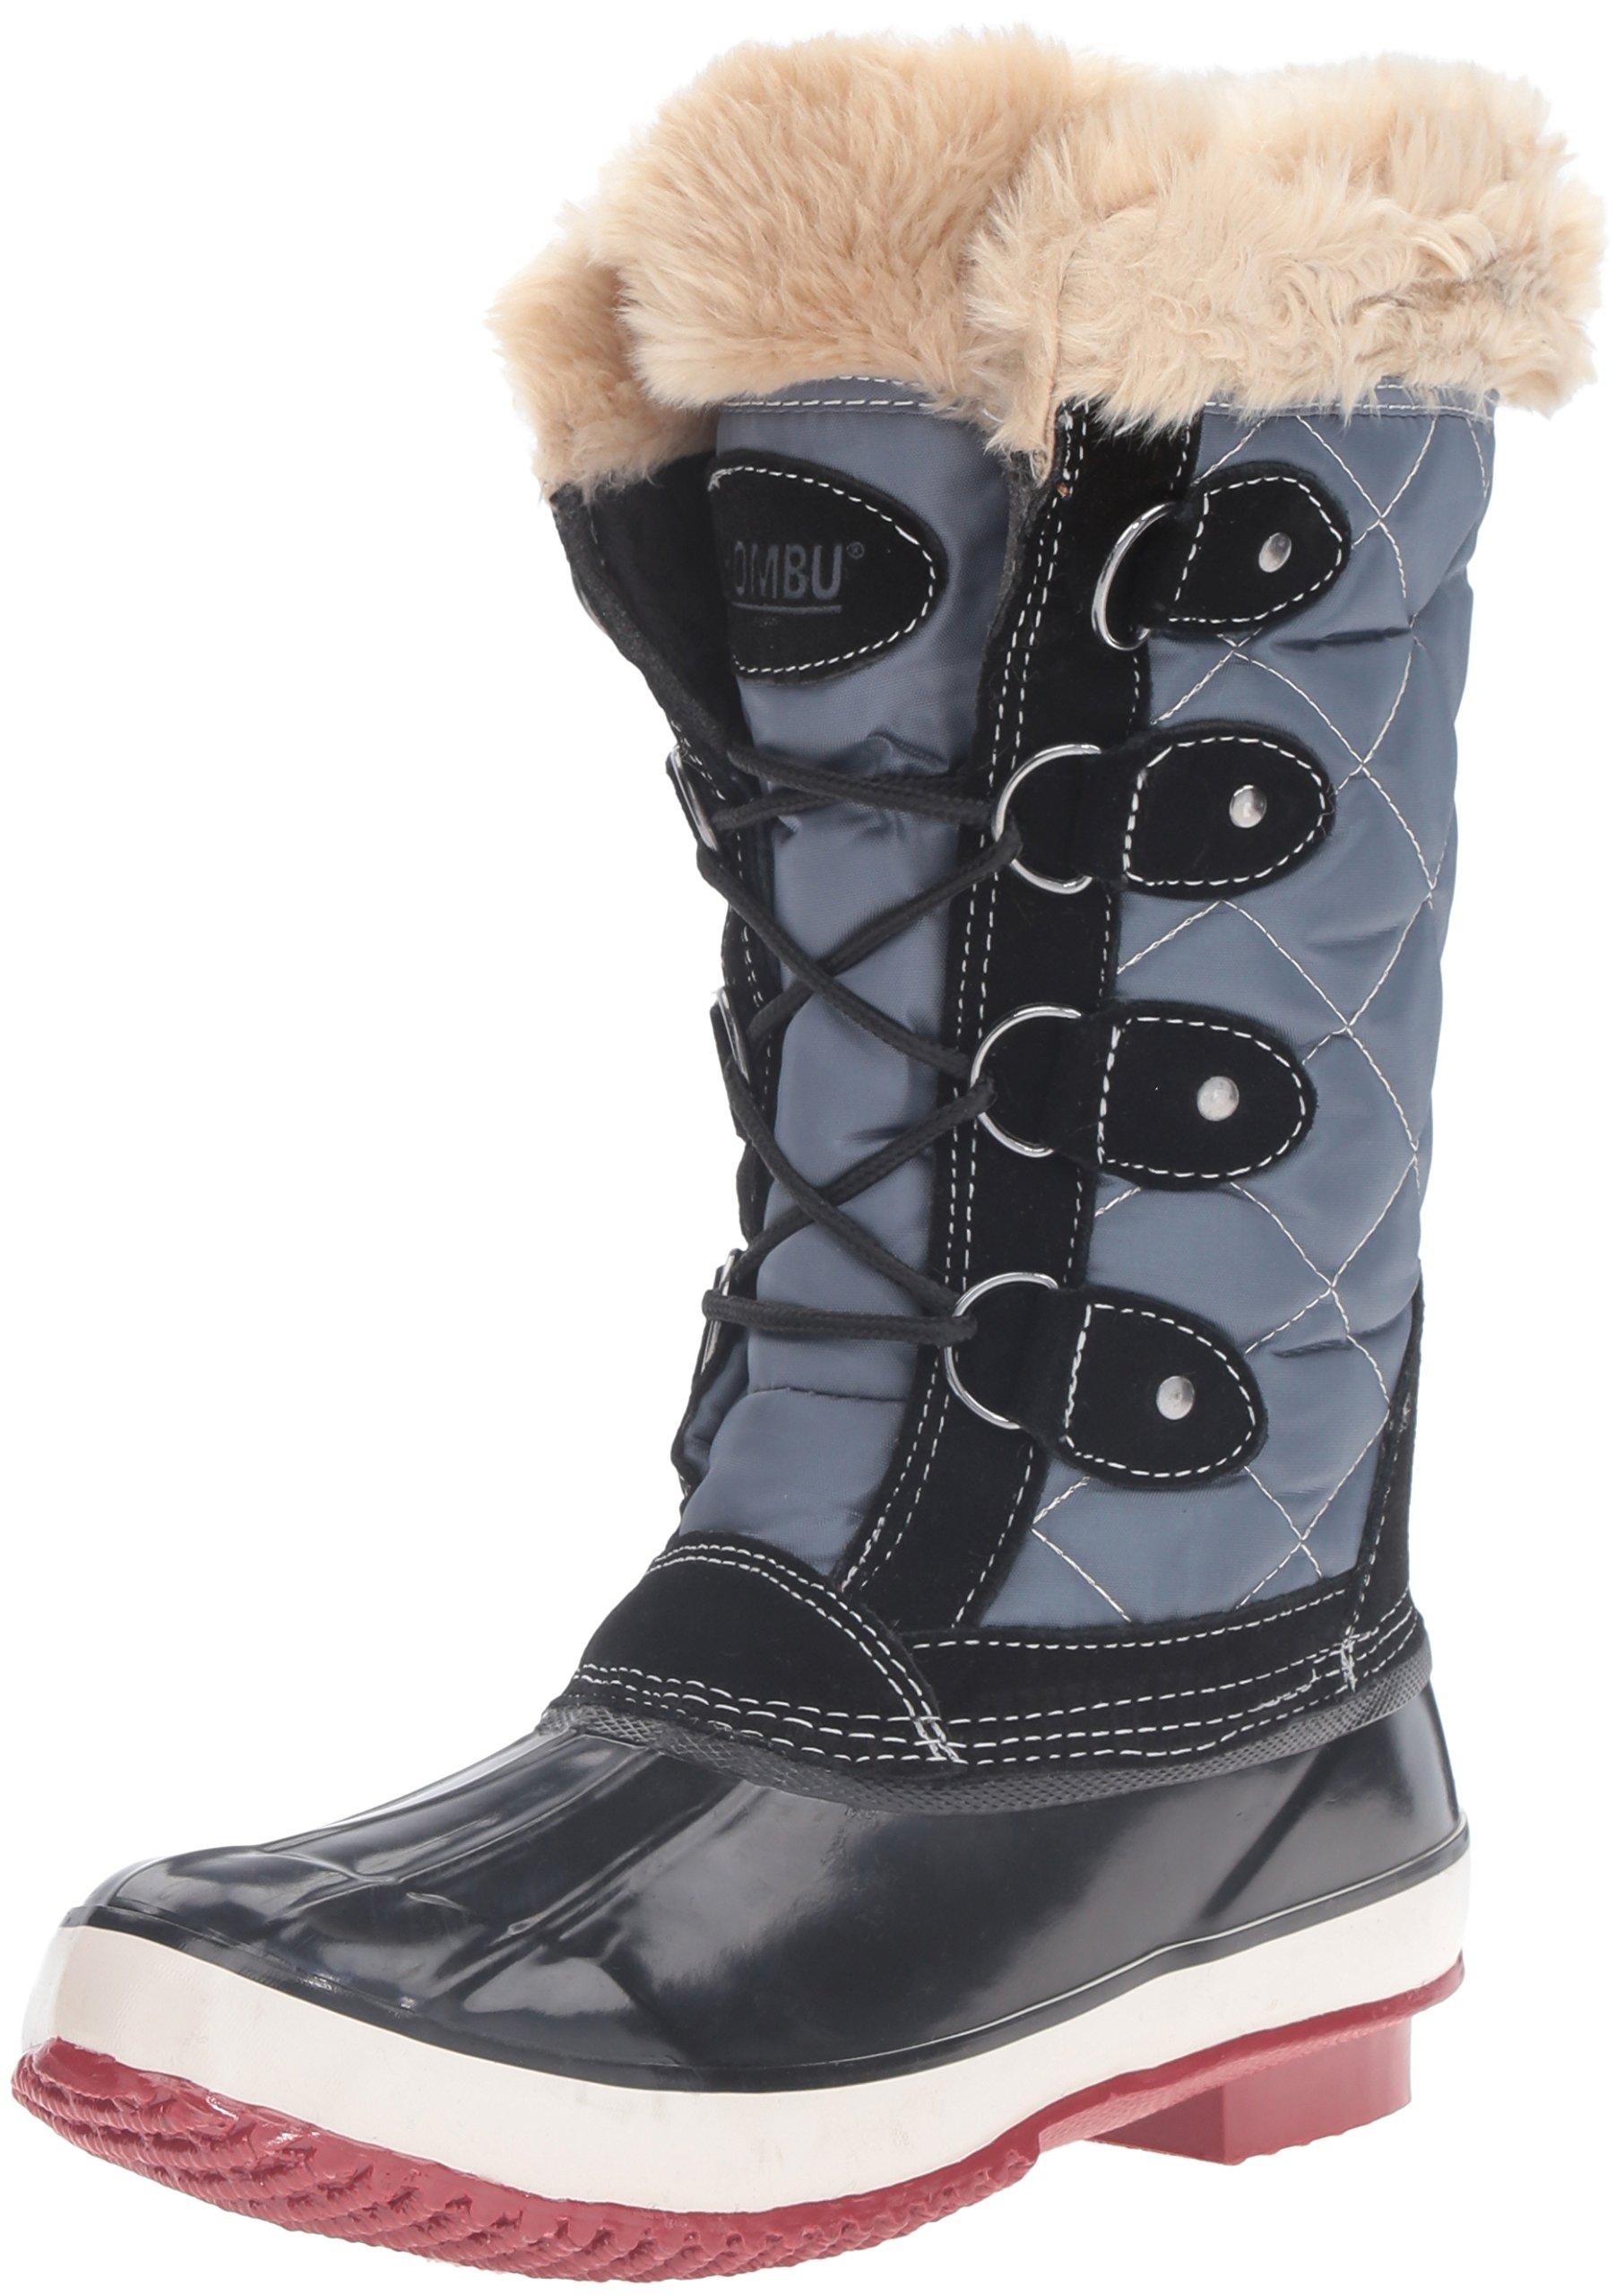 Khombu Women's Andie Snow Boot, Black, 8 M US